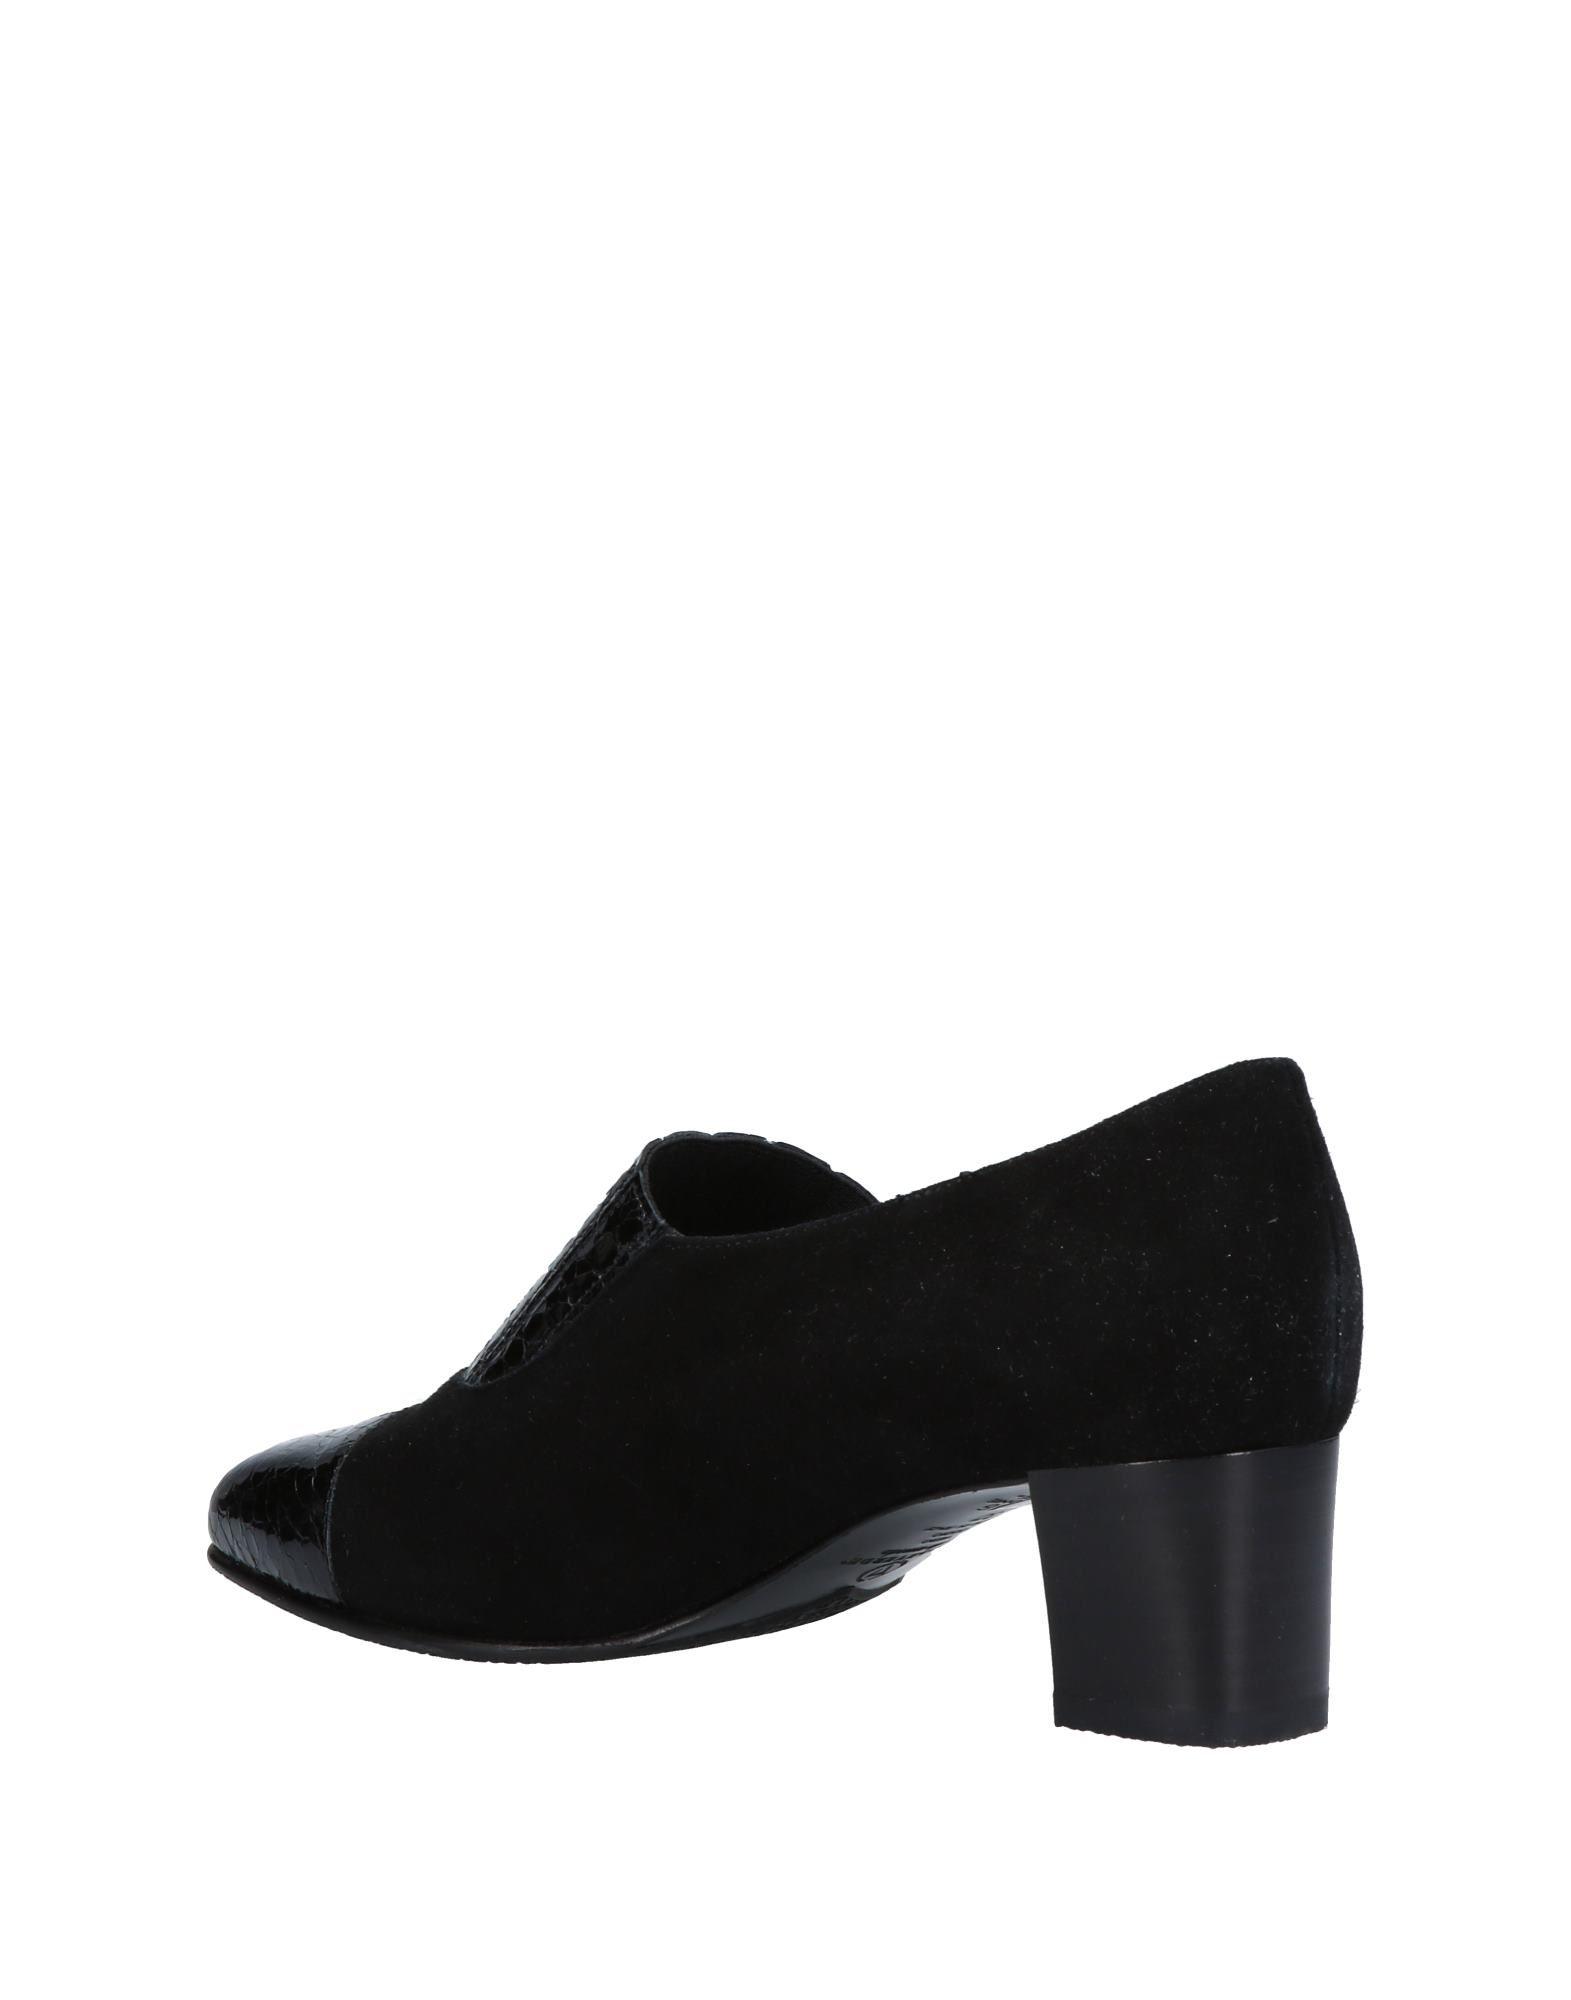 Valleverde Gute Pumps Damen  11467583DI Gute Valleverde Qualität beliebte Schuhe 5743a9